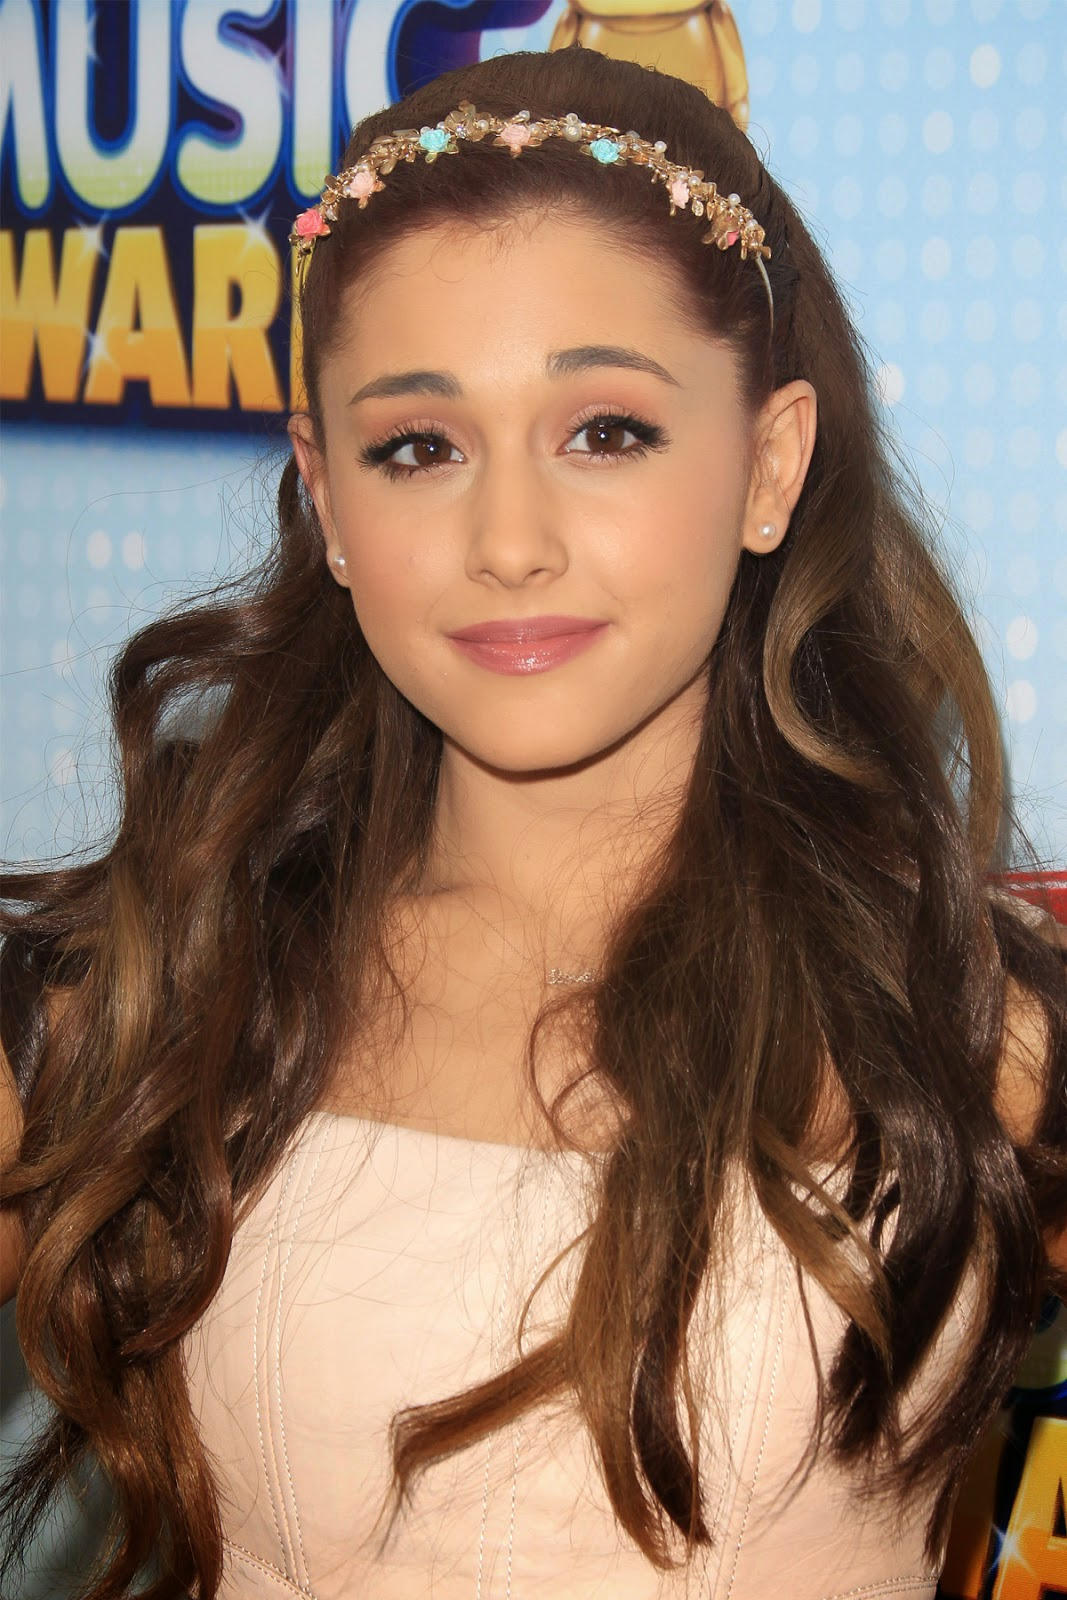 Ariana Grande HD Wallpapers | HD Wallpapers (High ...